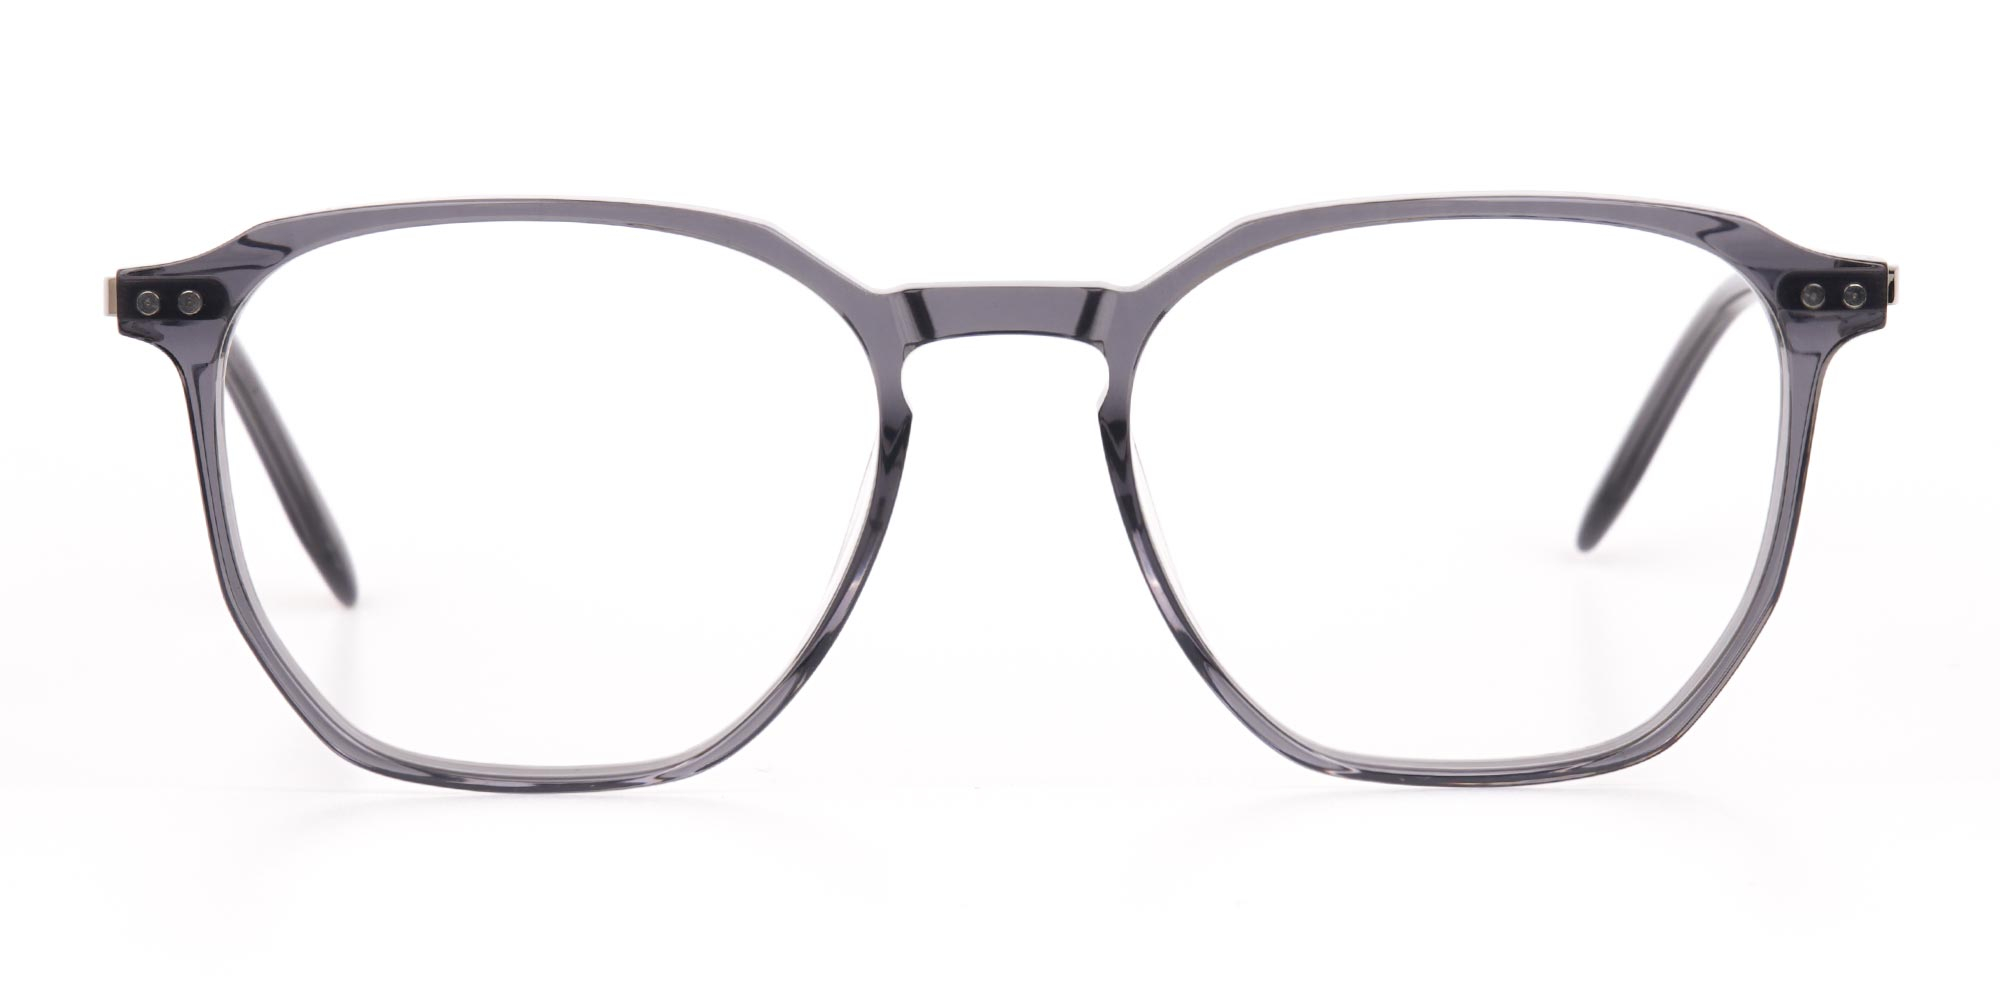 silver grey geometry frame 2020 eyewear trend